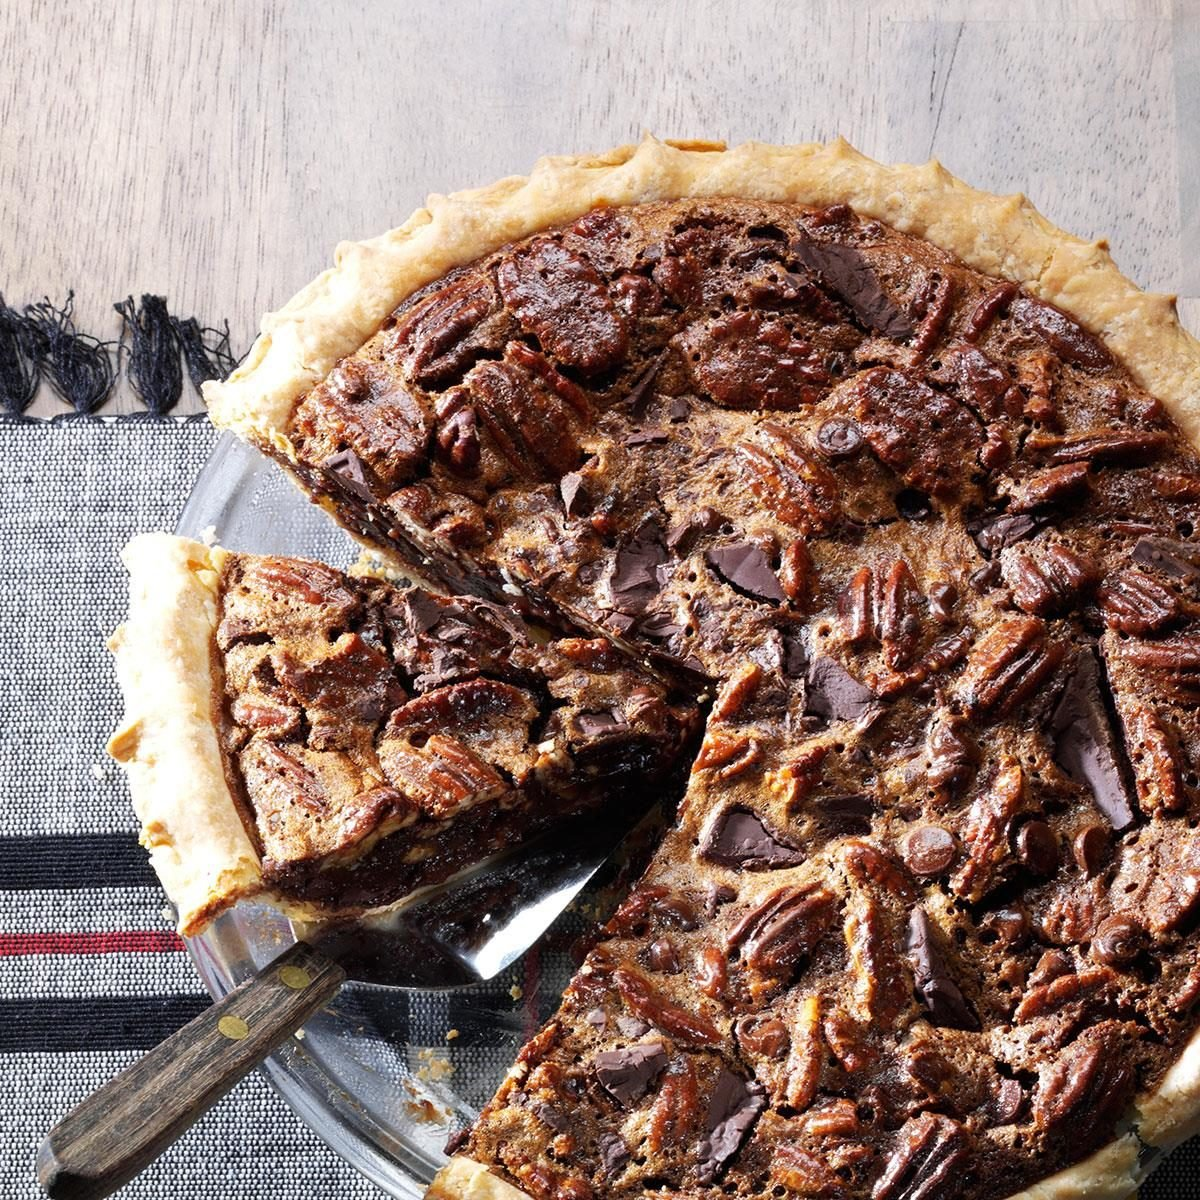 Missouri: Ultimate Chocolate Chunk Pecan Pie